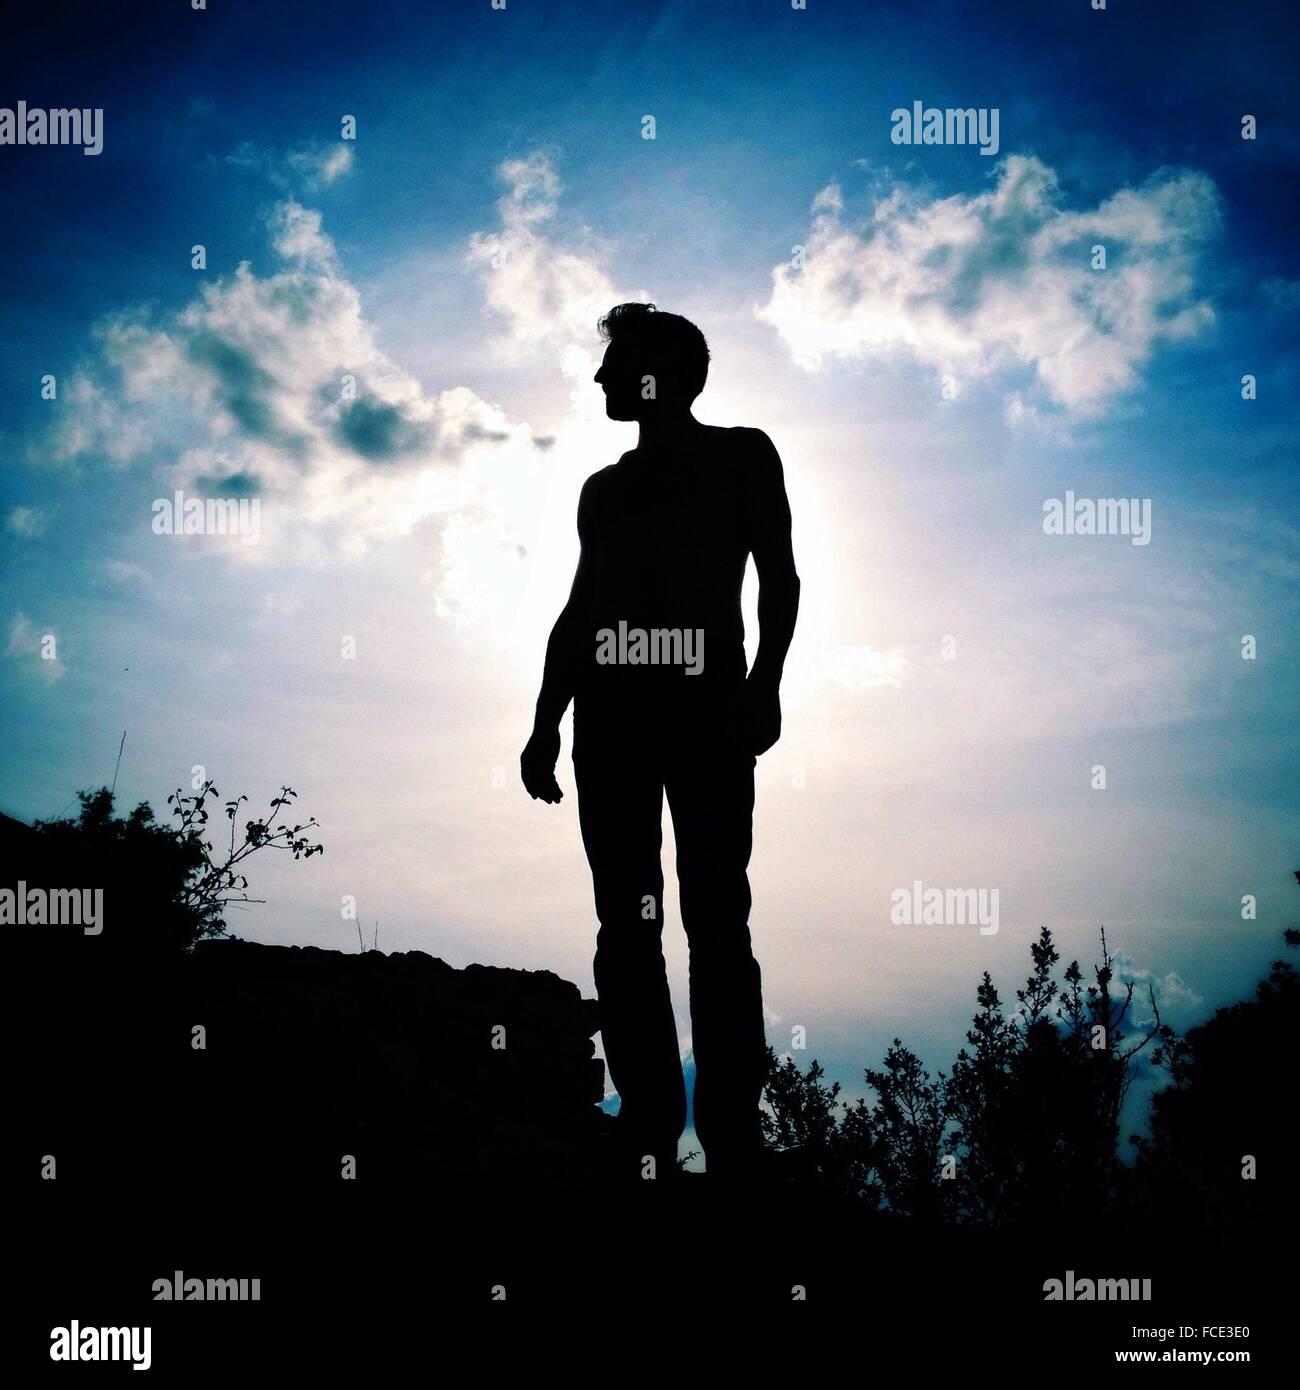 Silhouette Of Man - Stock Image